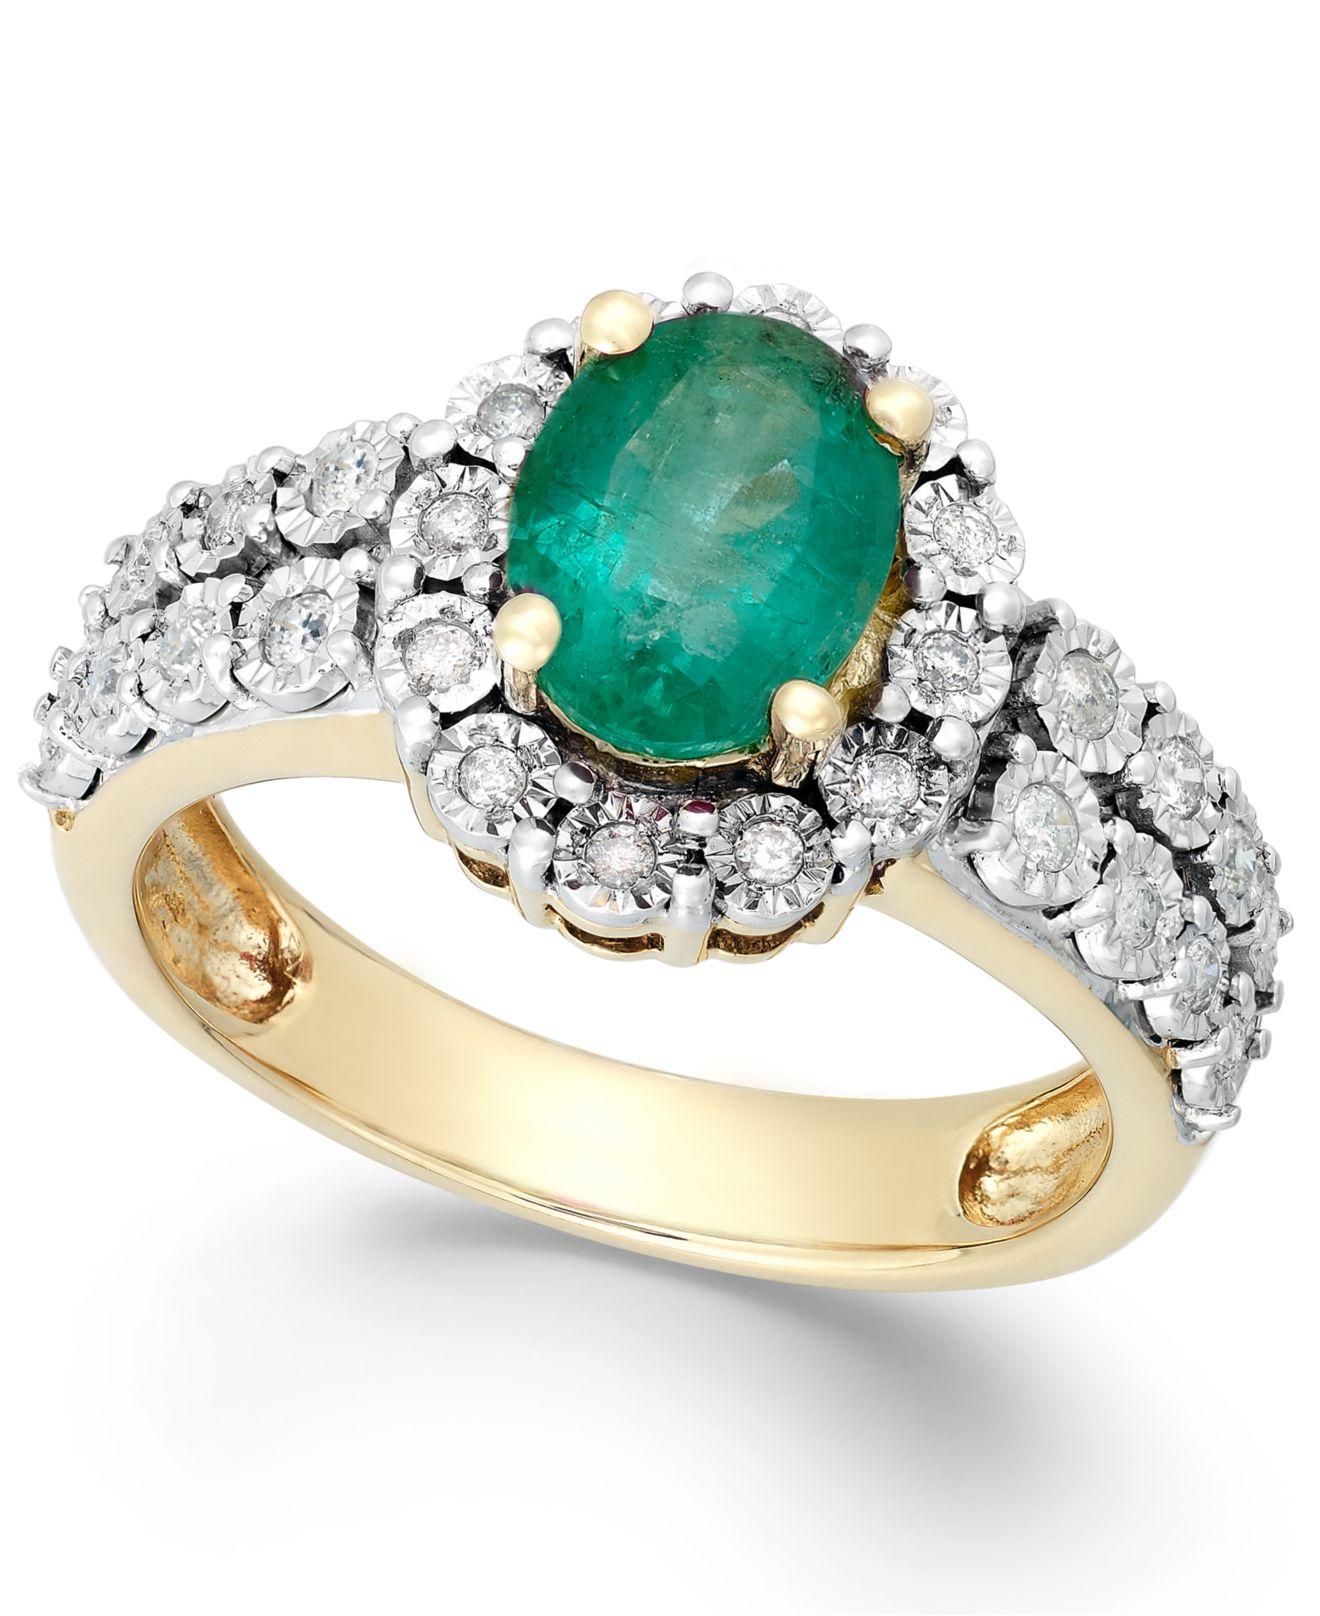 macy s emerald 3 4 ct t w and 1 4 ct t w